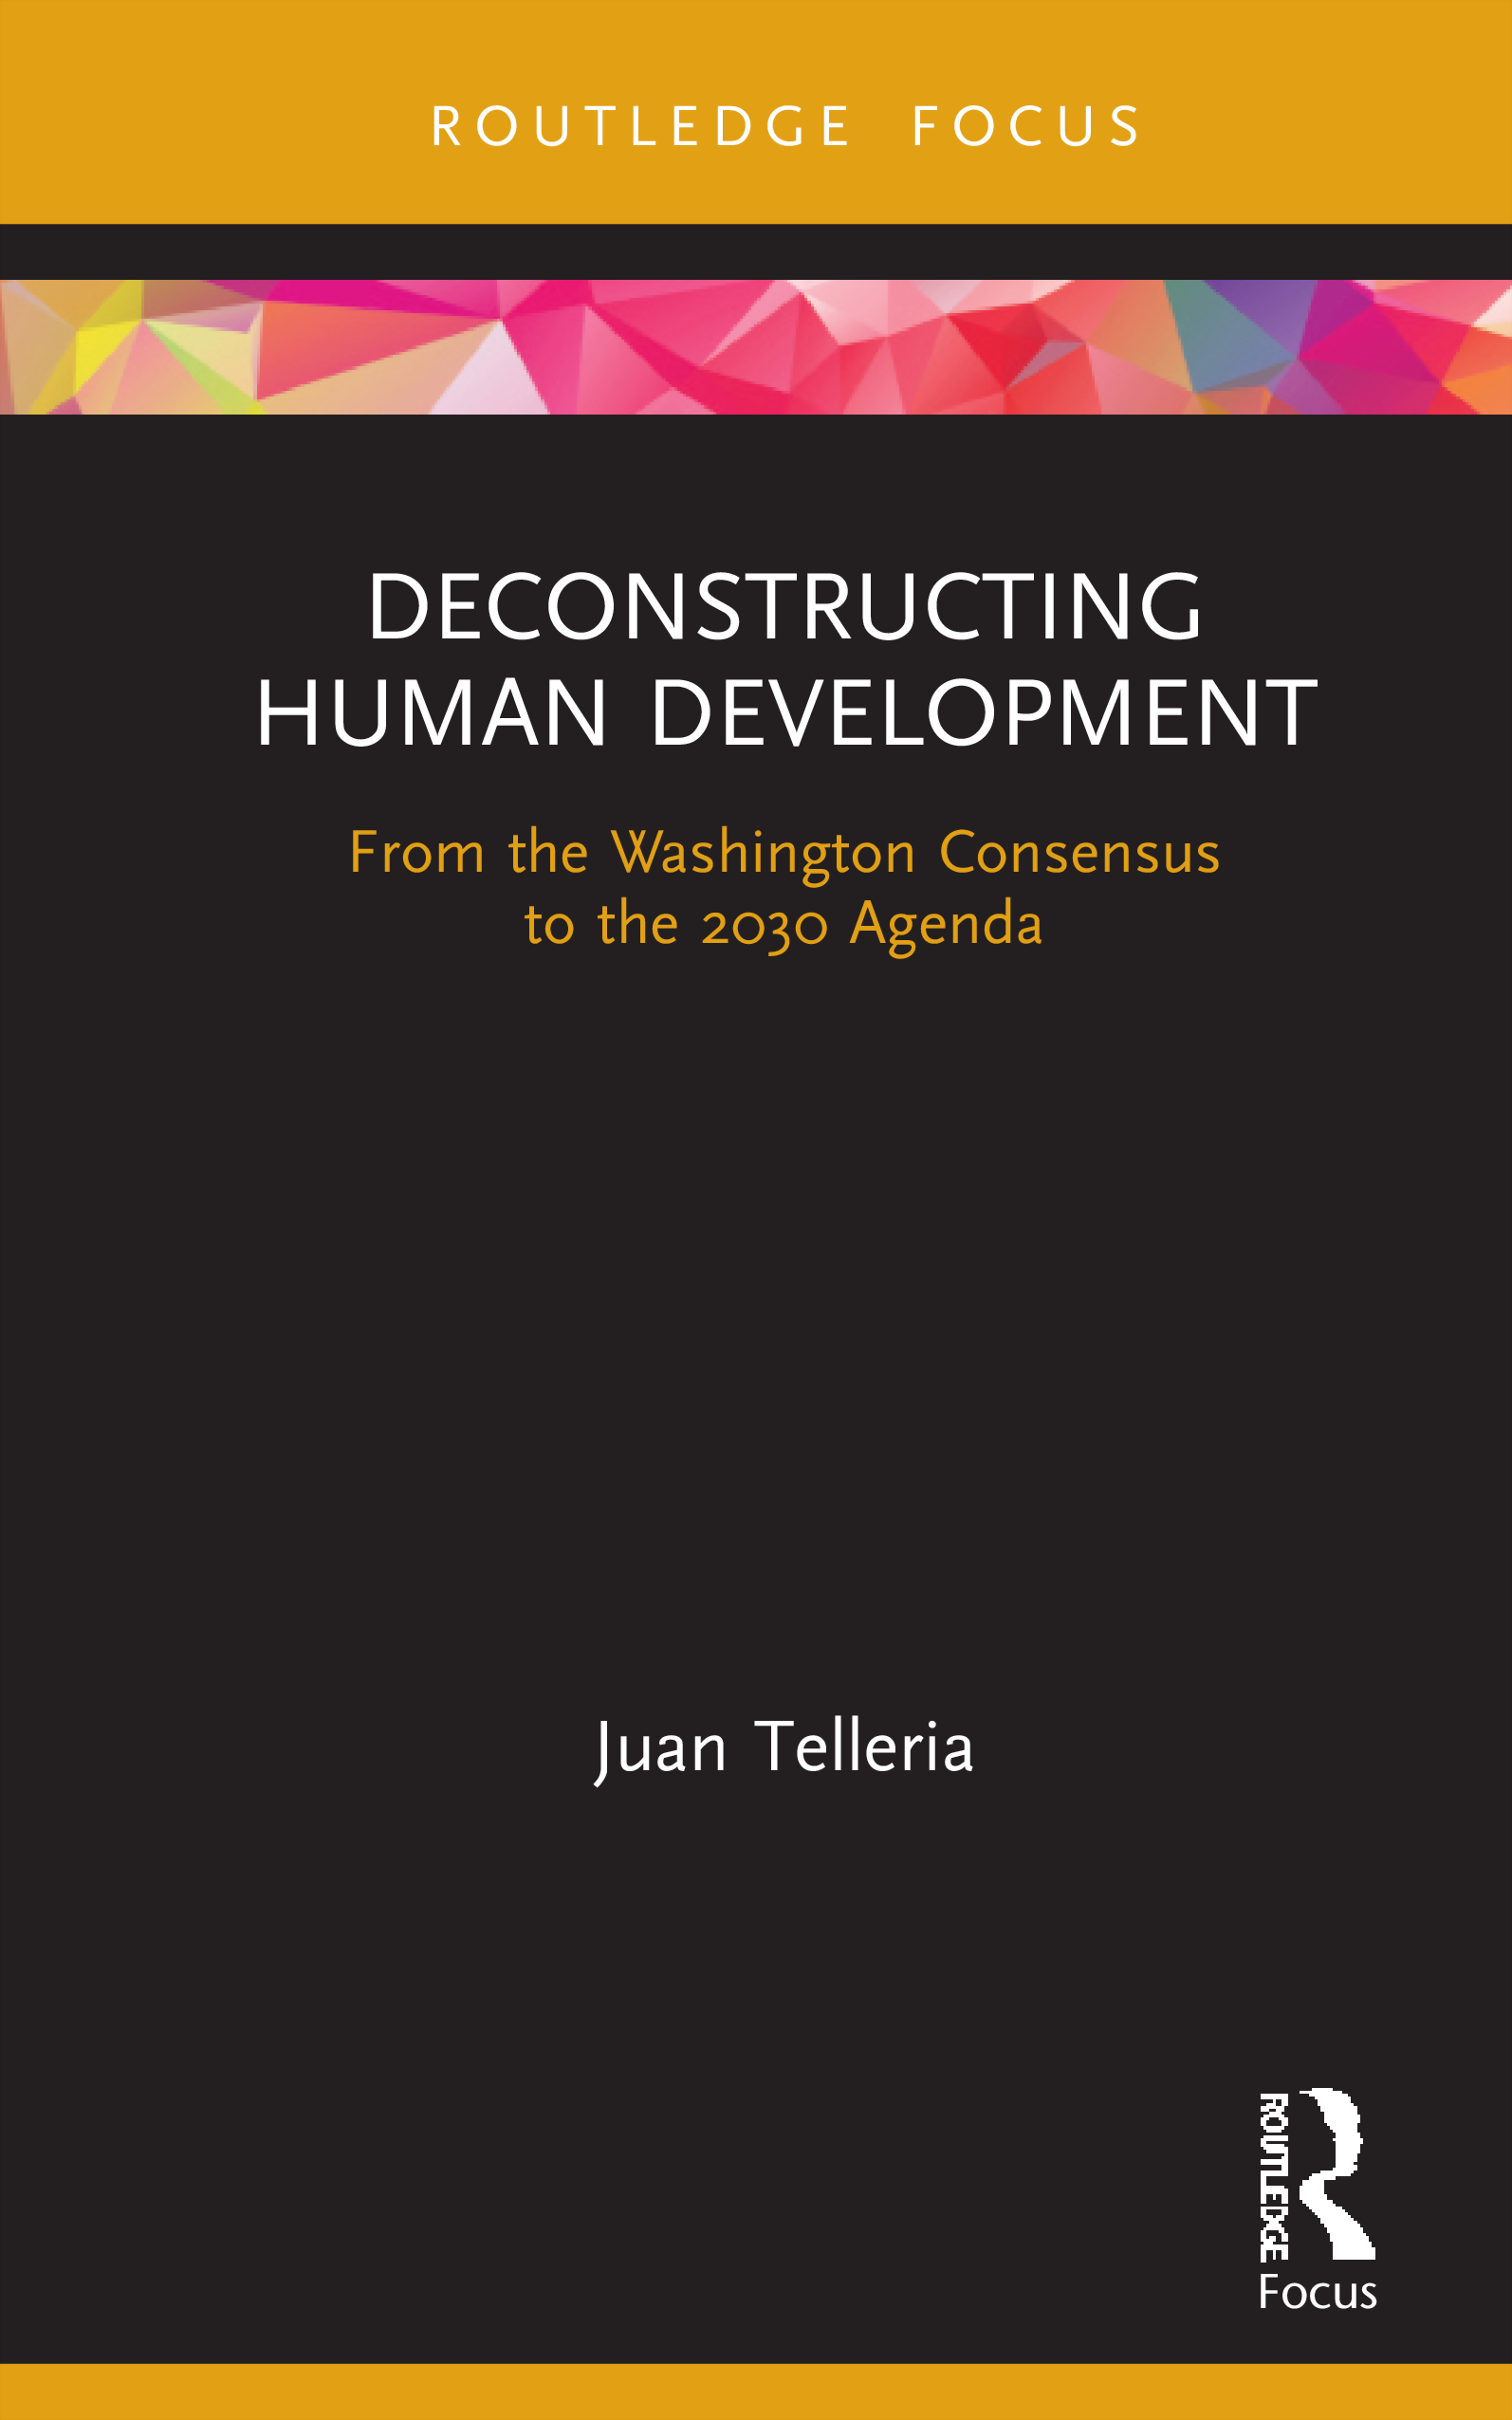 Deconstructing Human Development